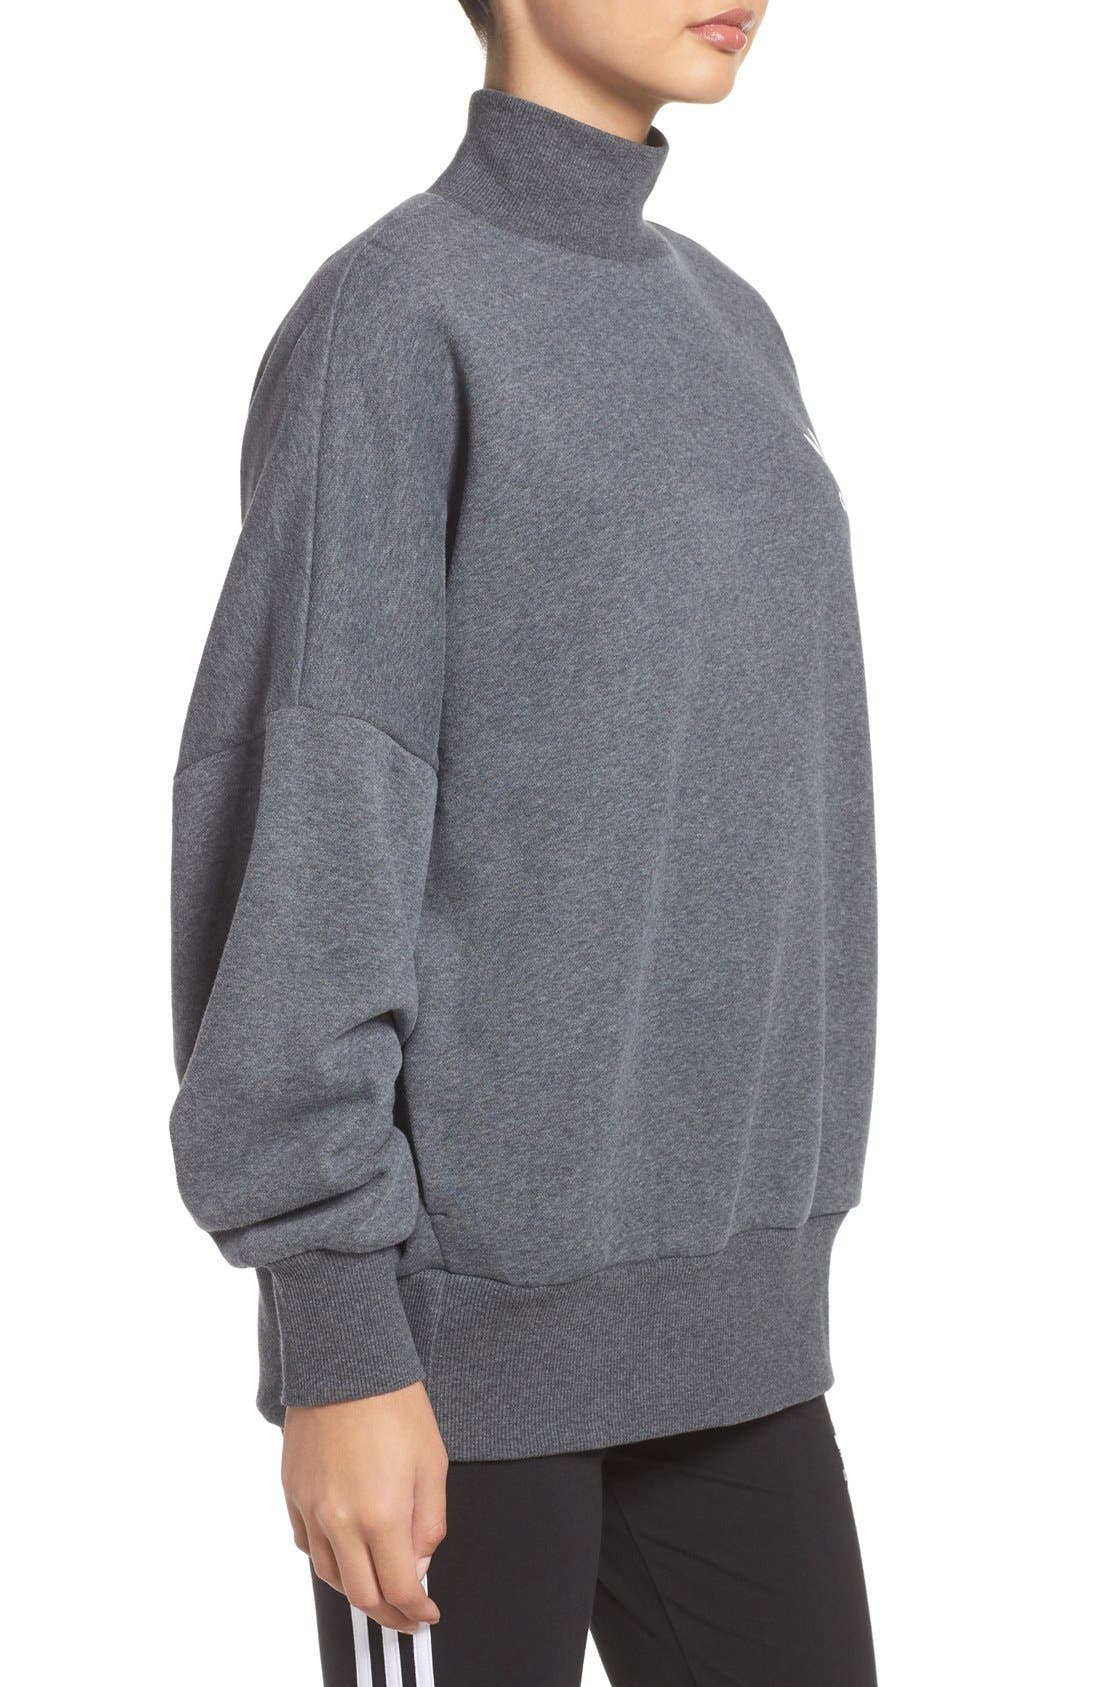 Alternate Image 3  - adidas Originals Mock Neck Sweatshirt